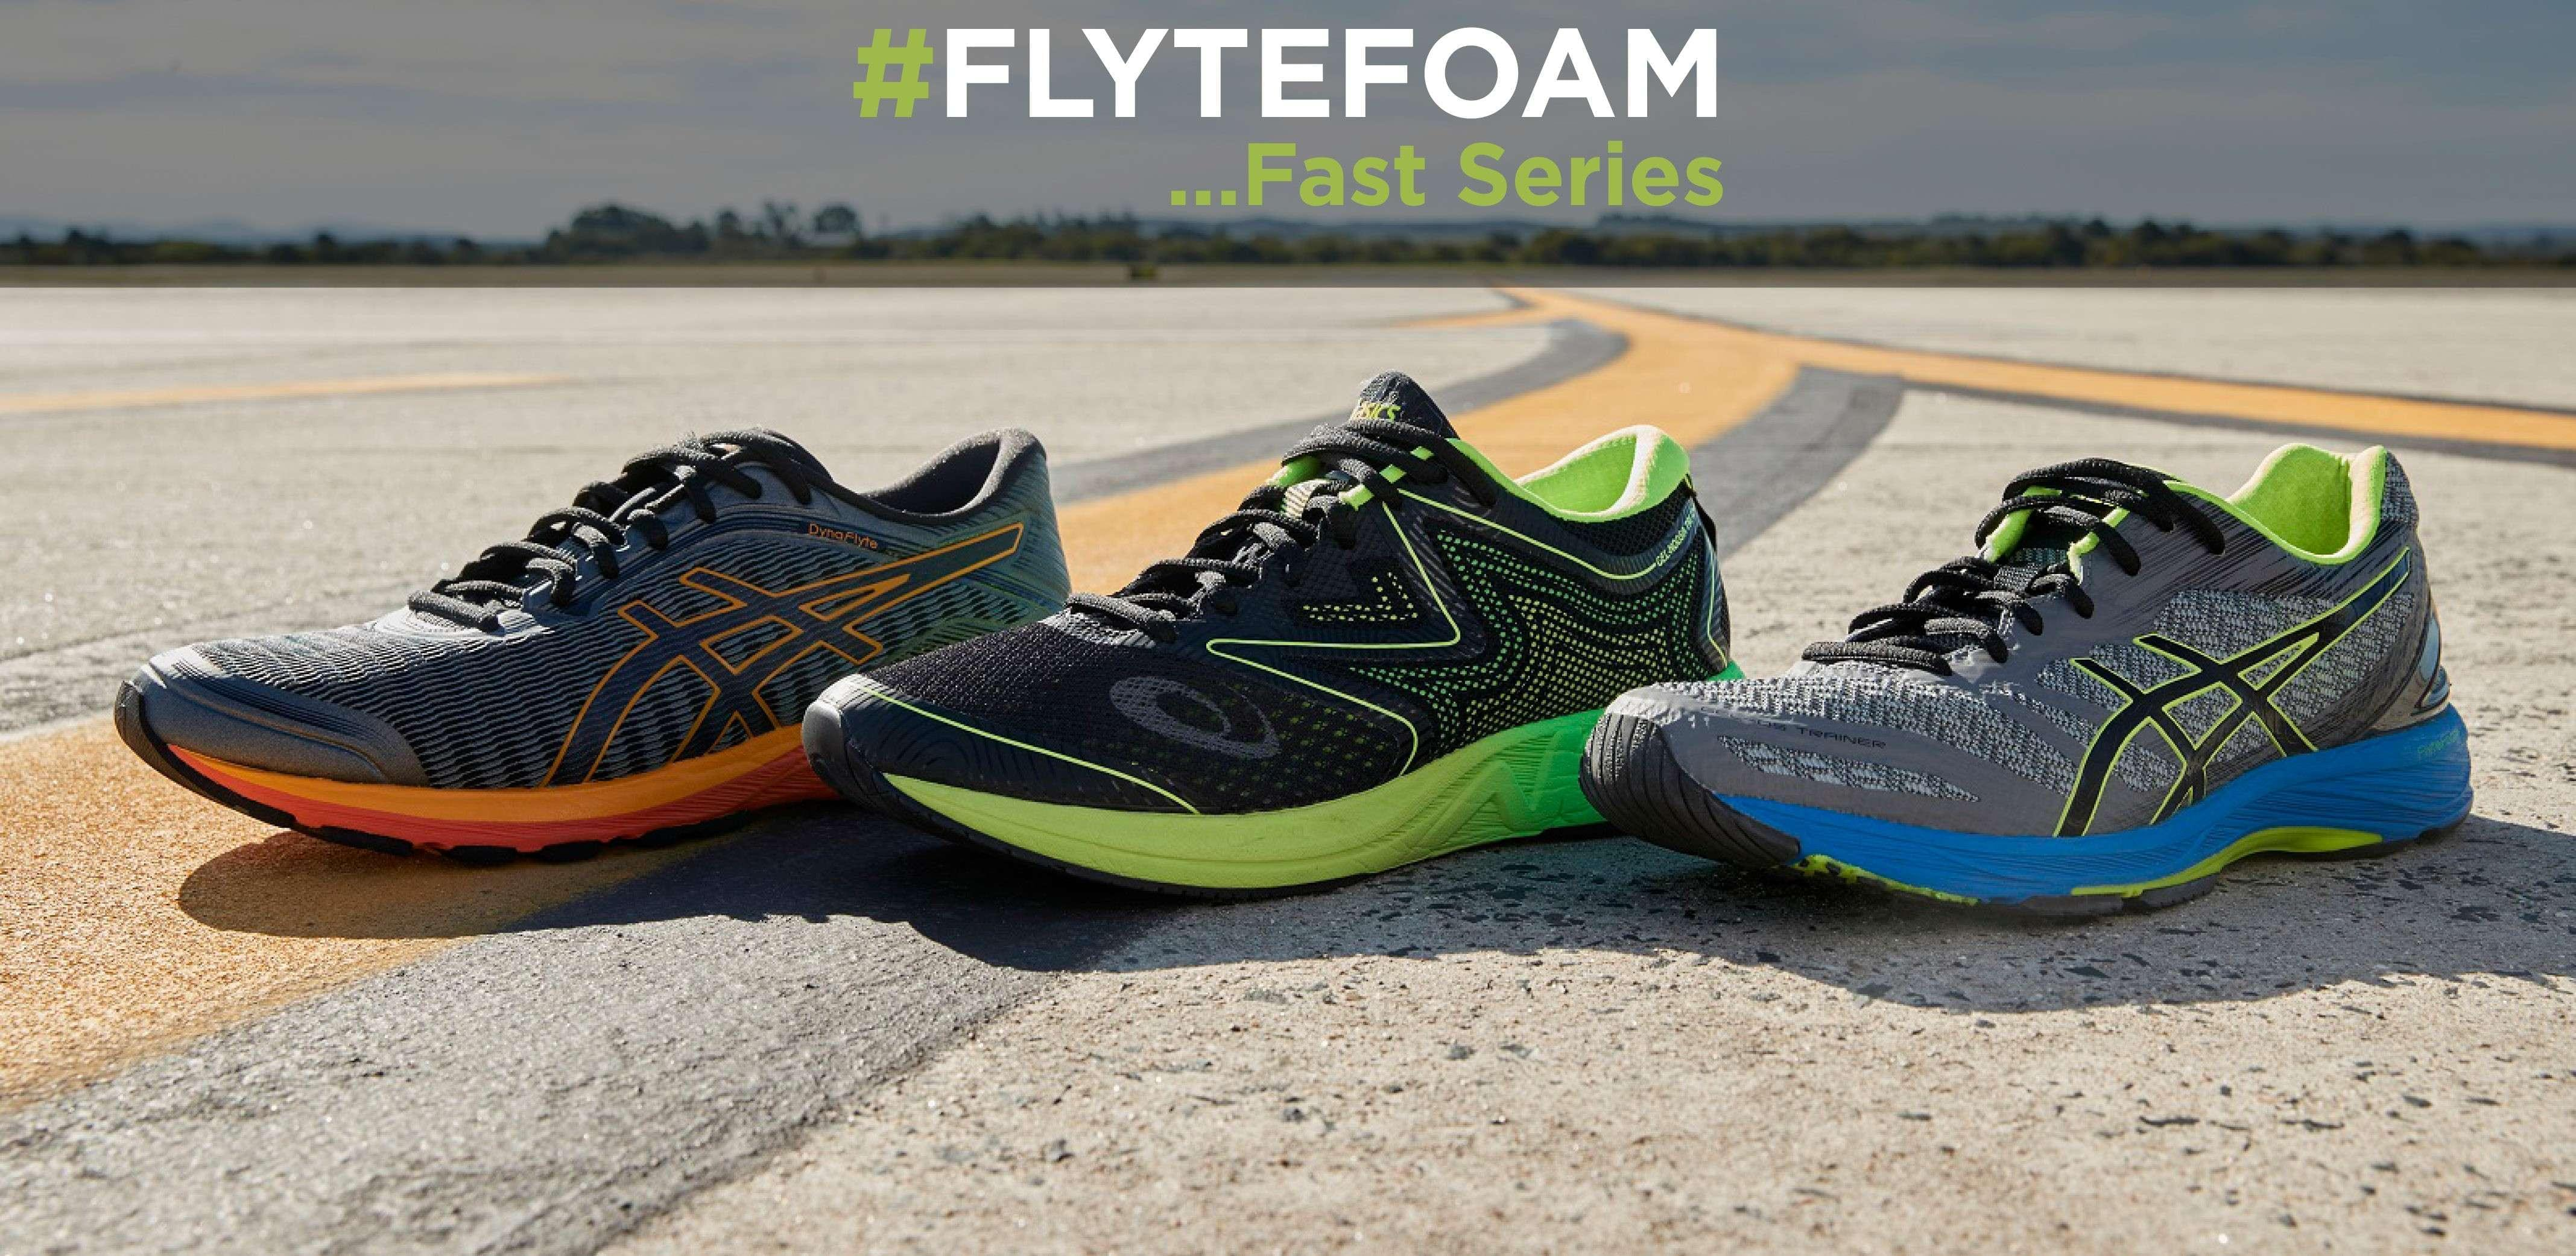 FlyteFoam Fast Serier